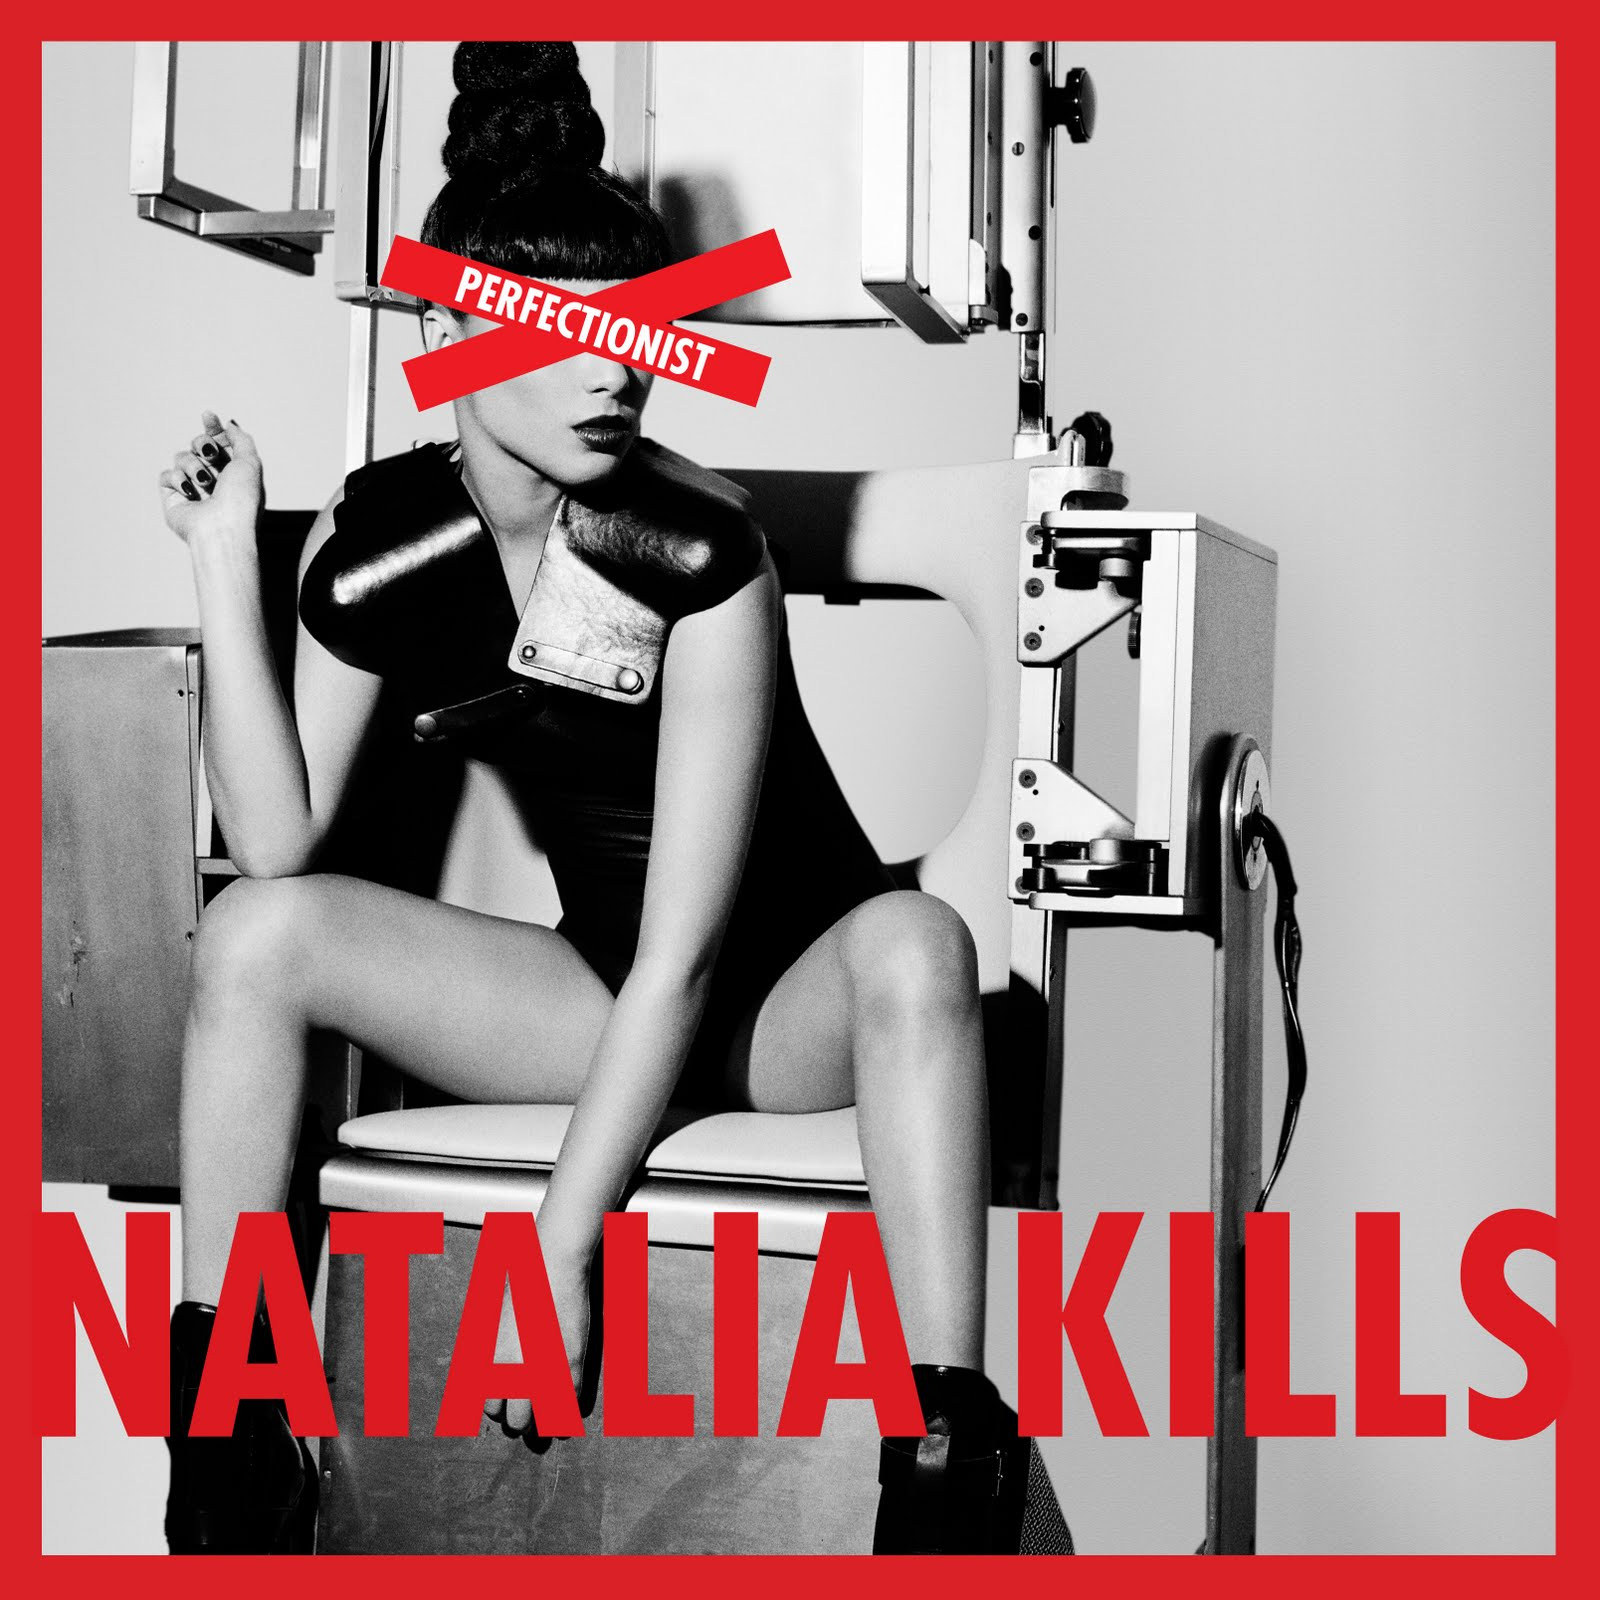 Natalia%2BKills%2B-%2BPerfectionist%2B%2